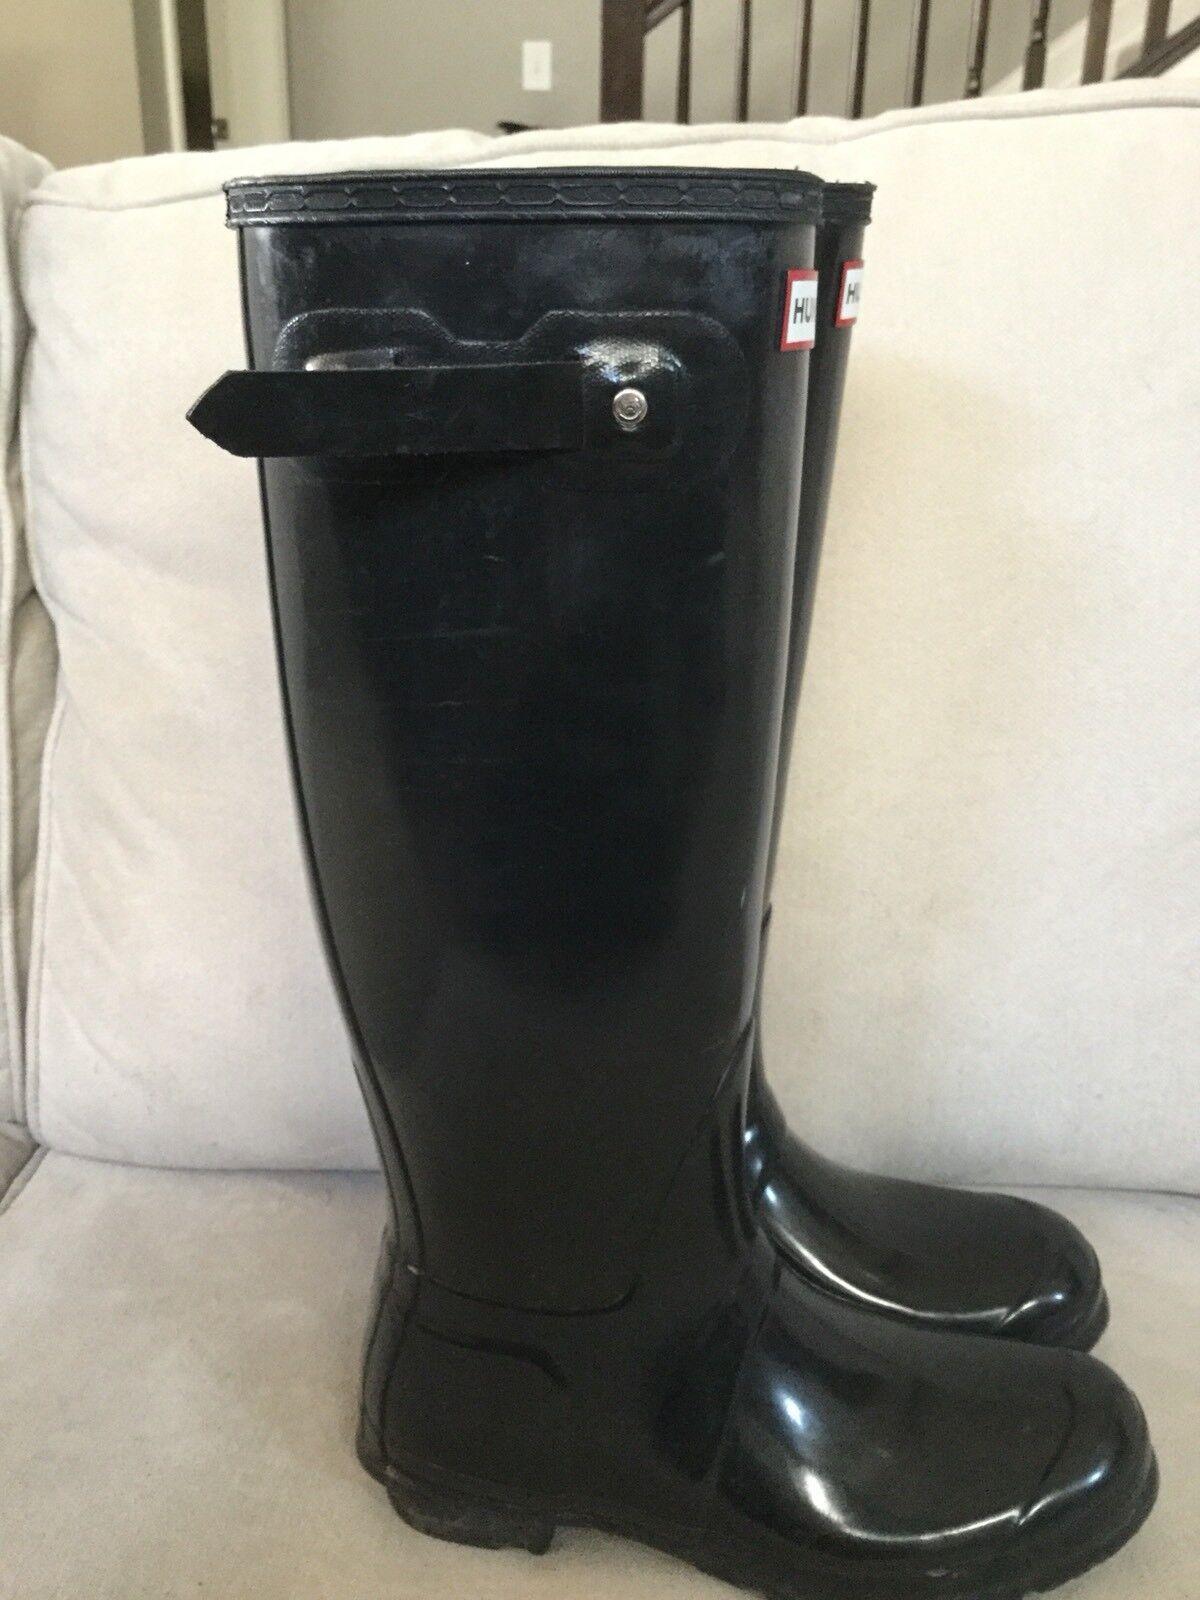 Hunter Original Tall Tall Tall Gloss Women Black Rubber Rain Boots Size US 8 746749